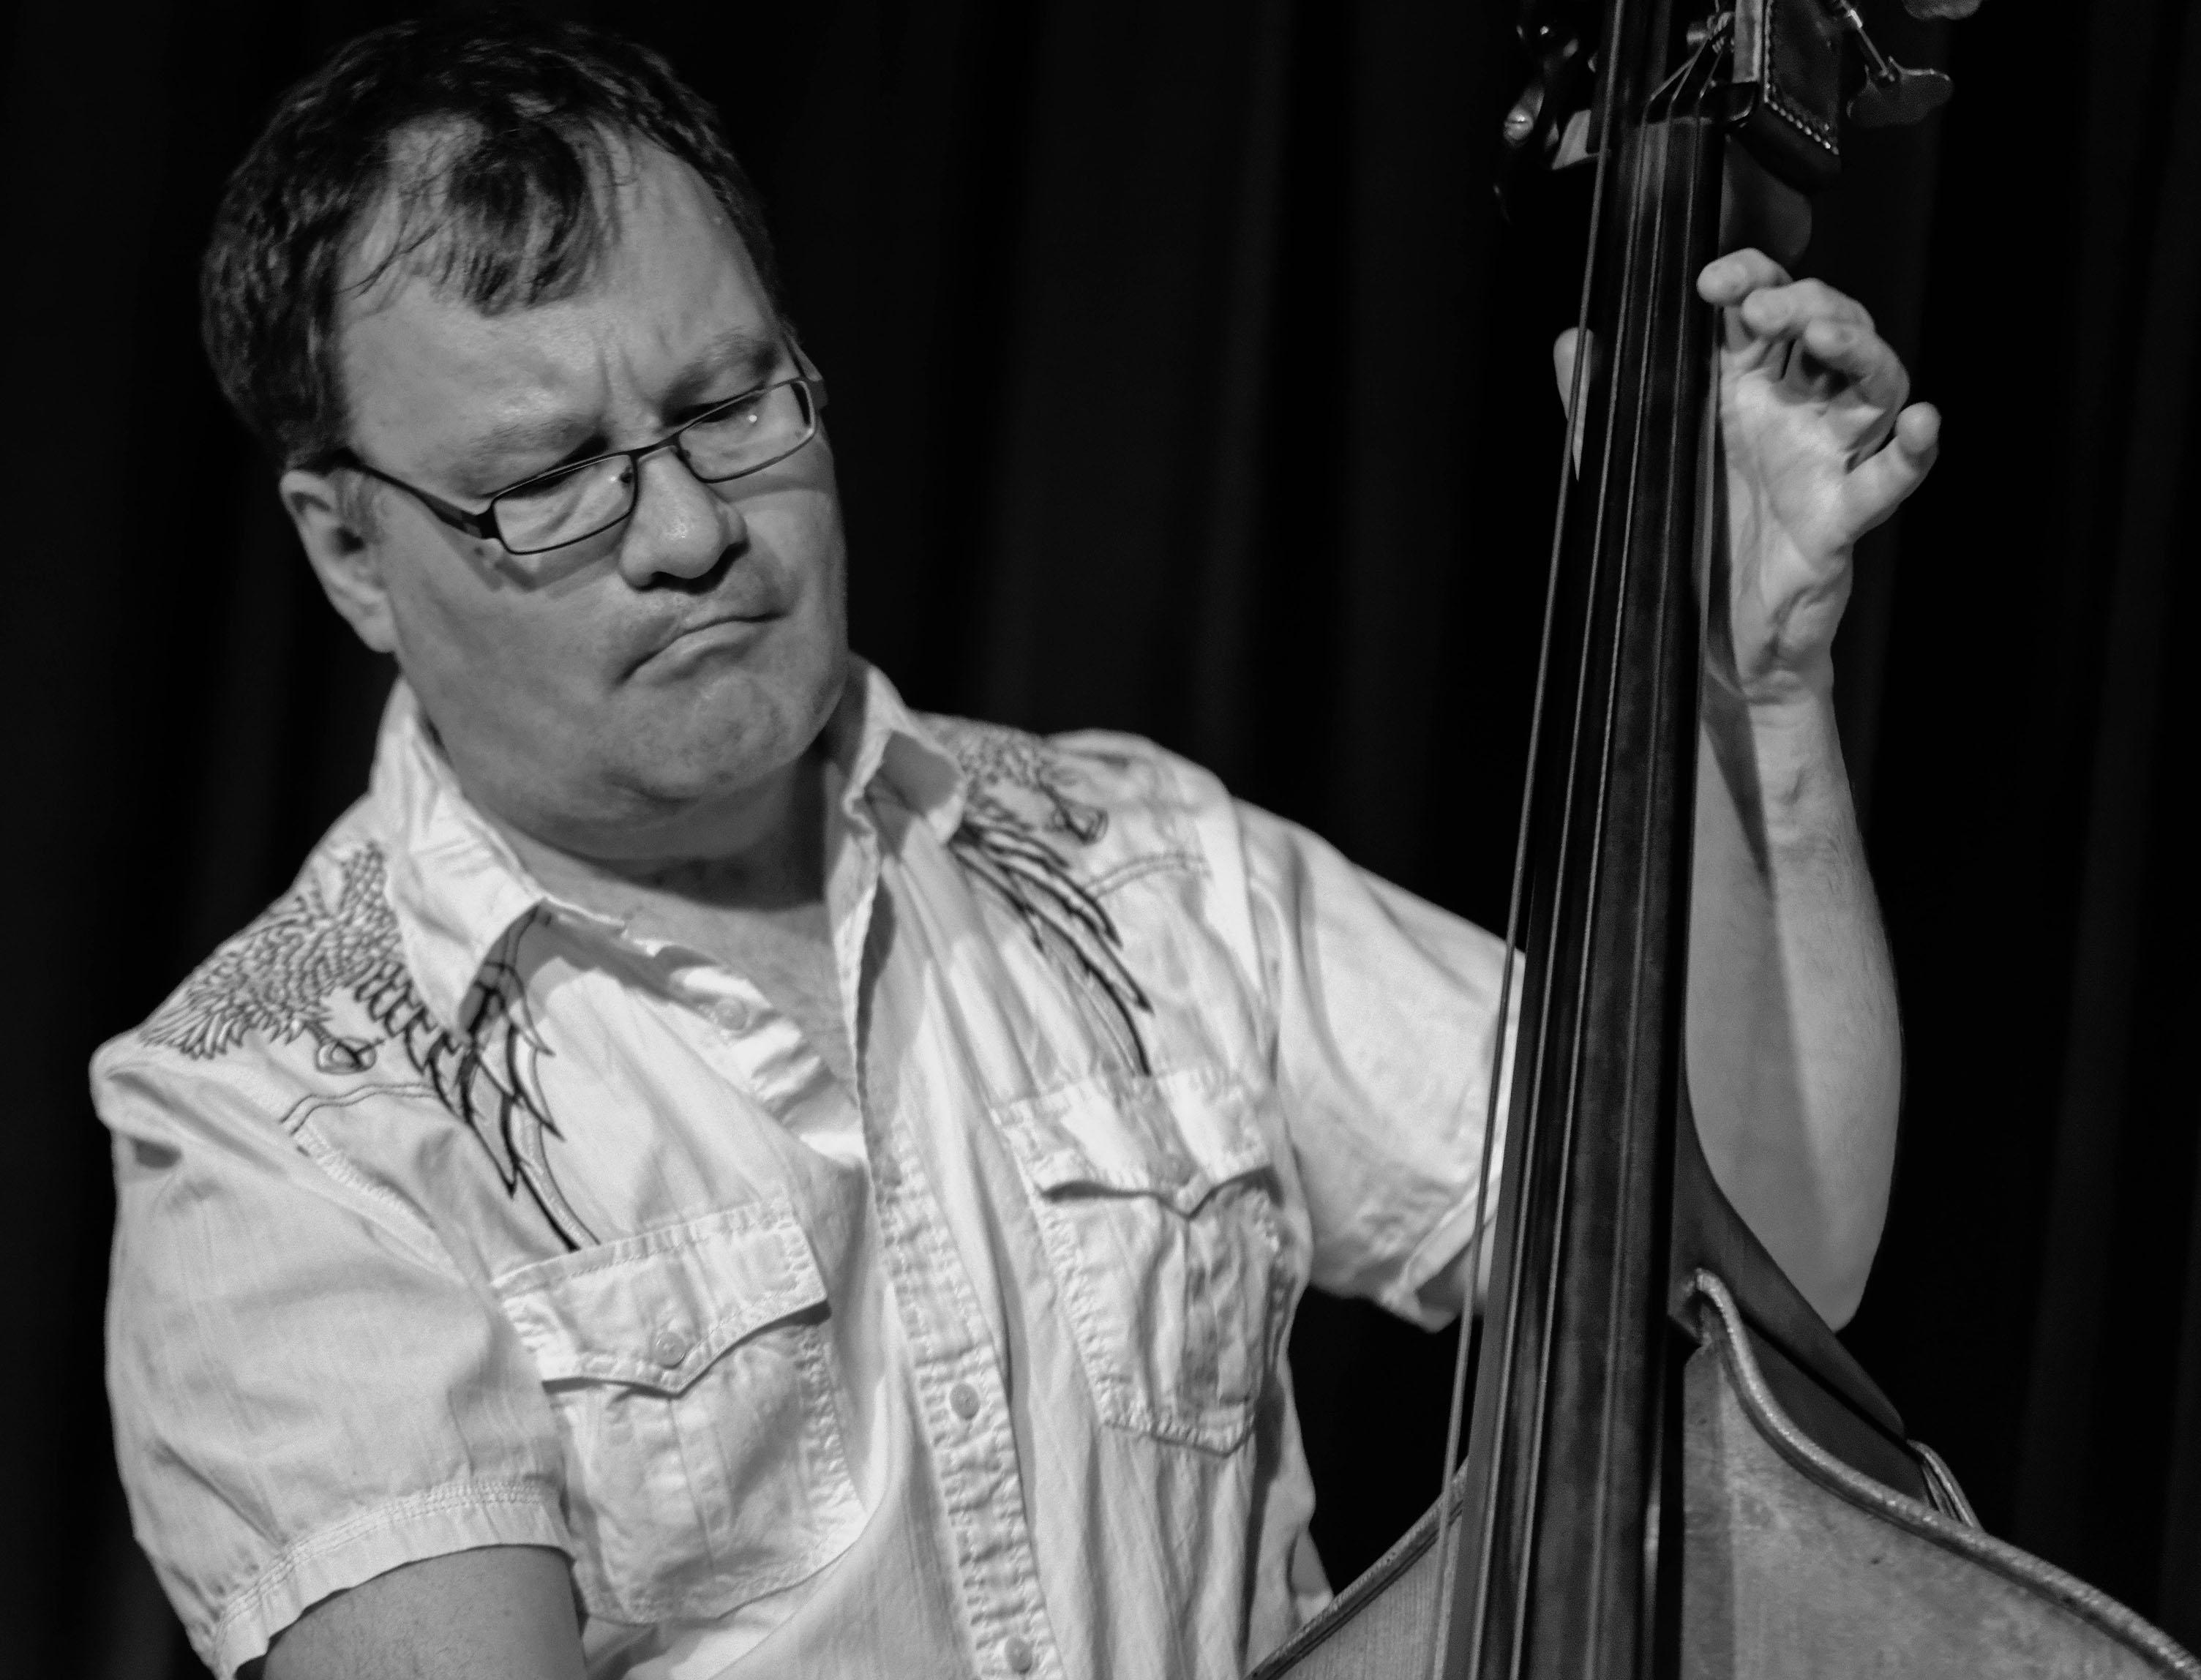 John Geggie, Ottawa, Canada, May 26, 2012